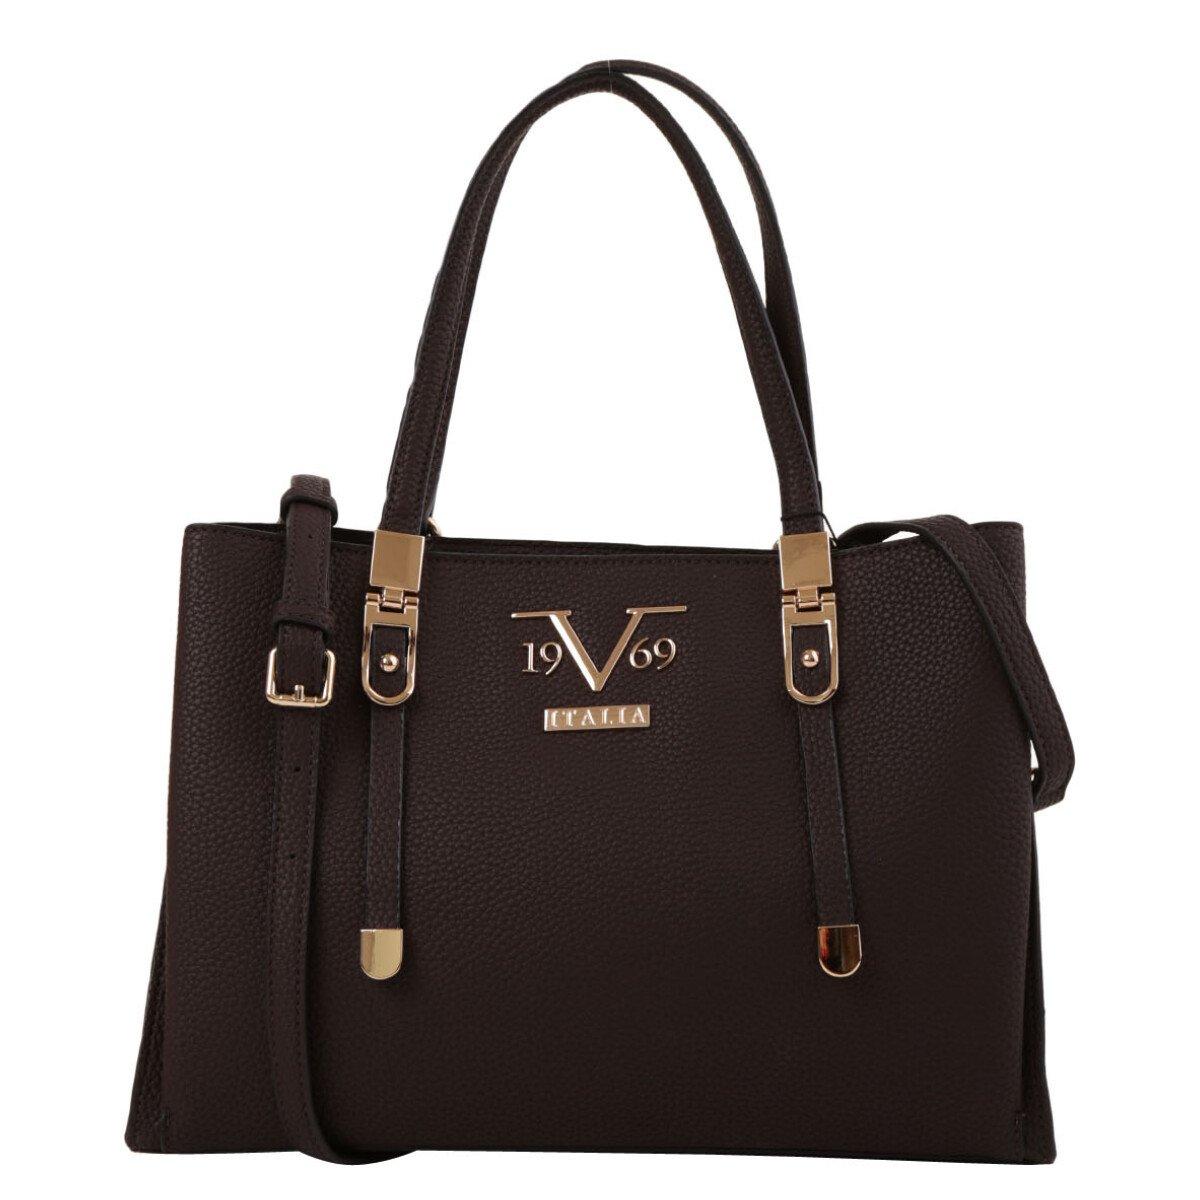 19v69 Italia Women's Handbag Various Colours 318969 - brown UNICA